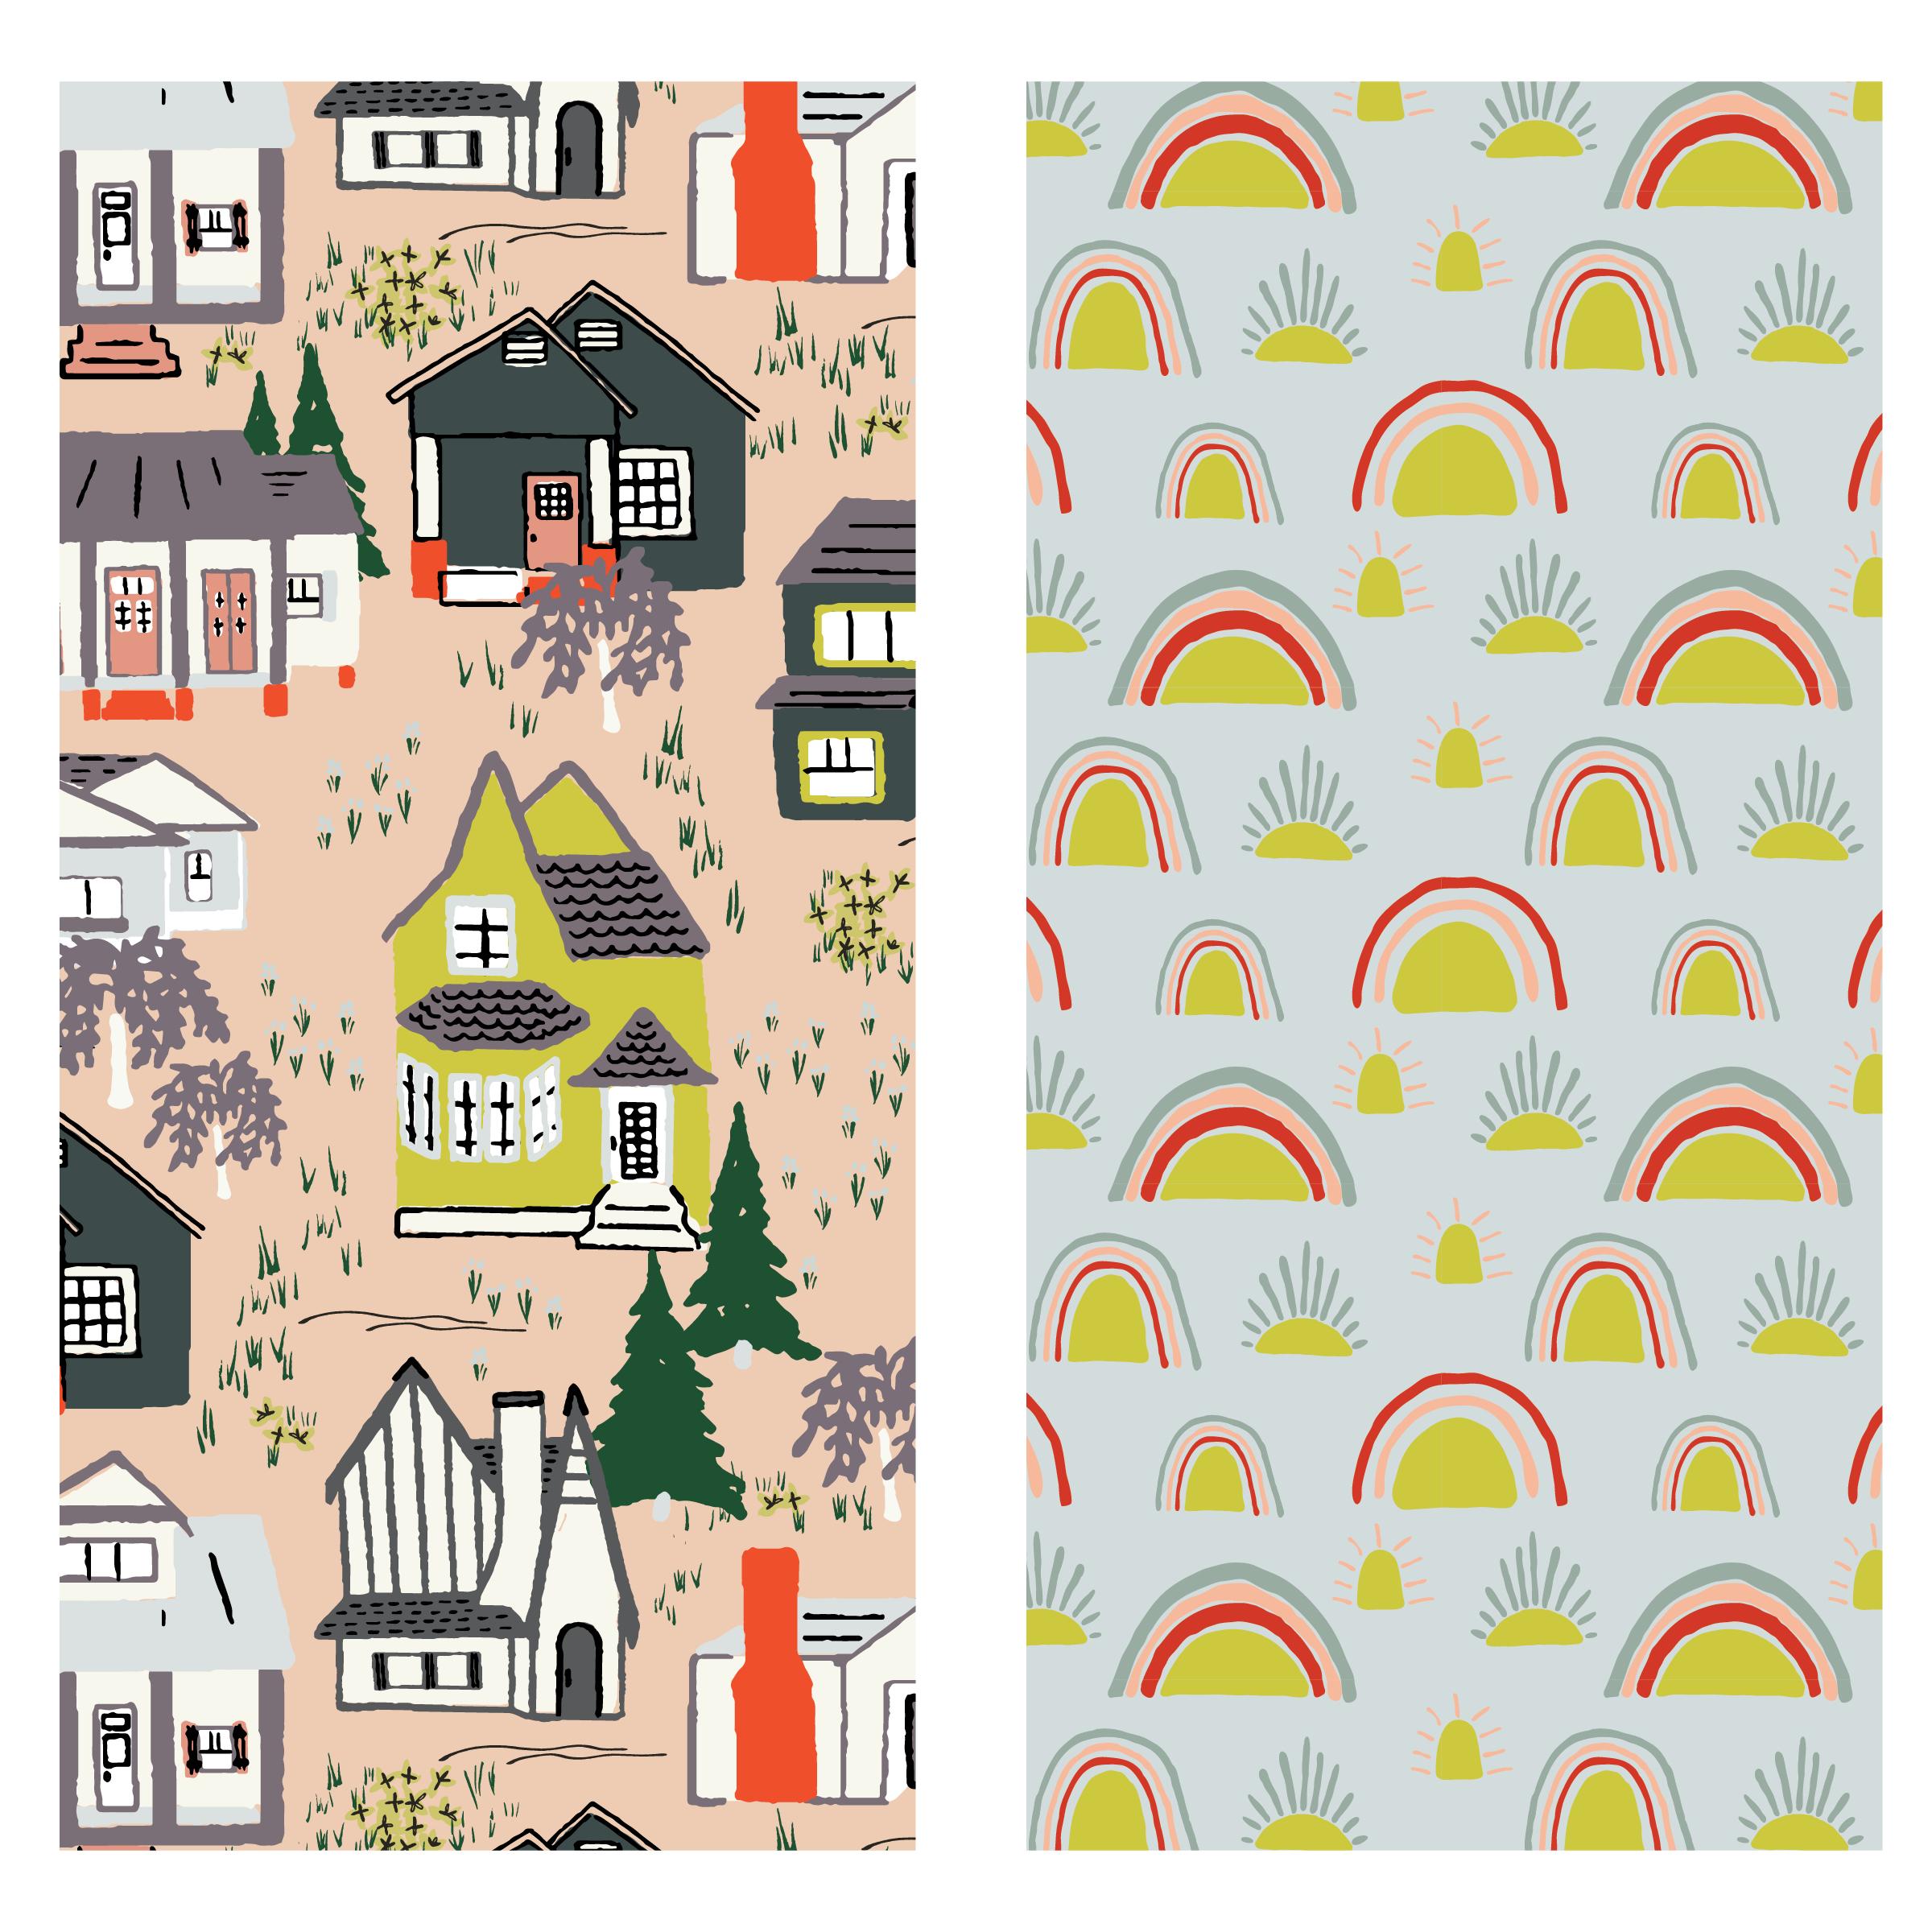 by HOPE johnson surface pattern design_pattern pair16.jpg